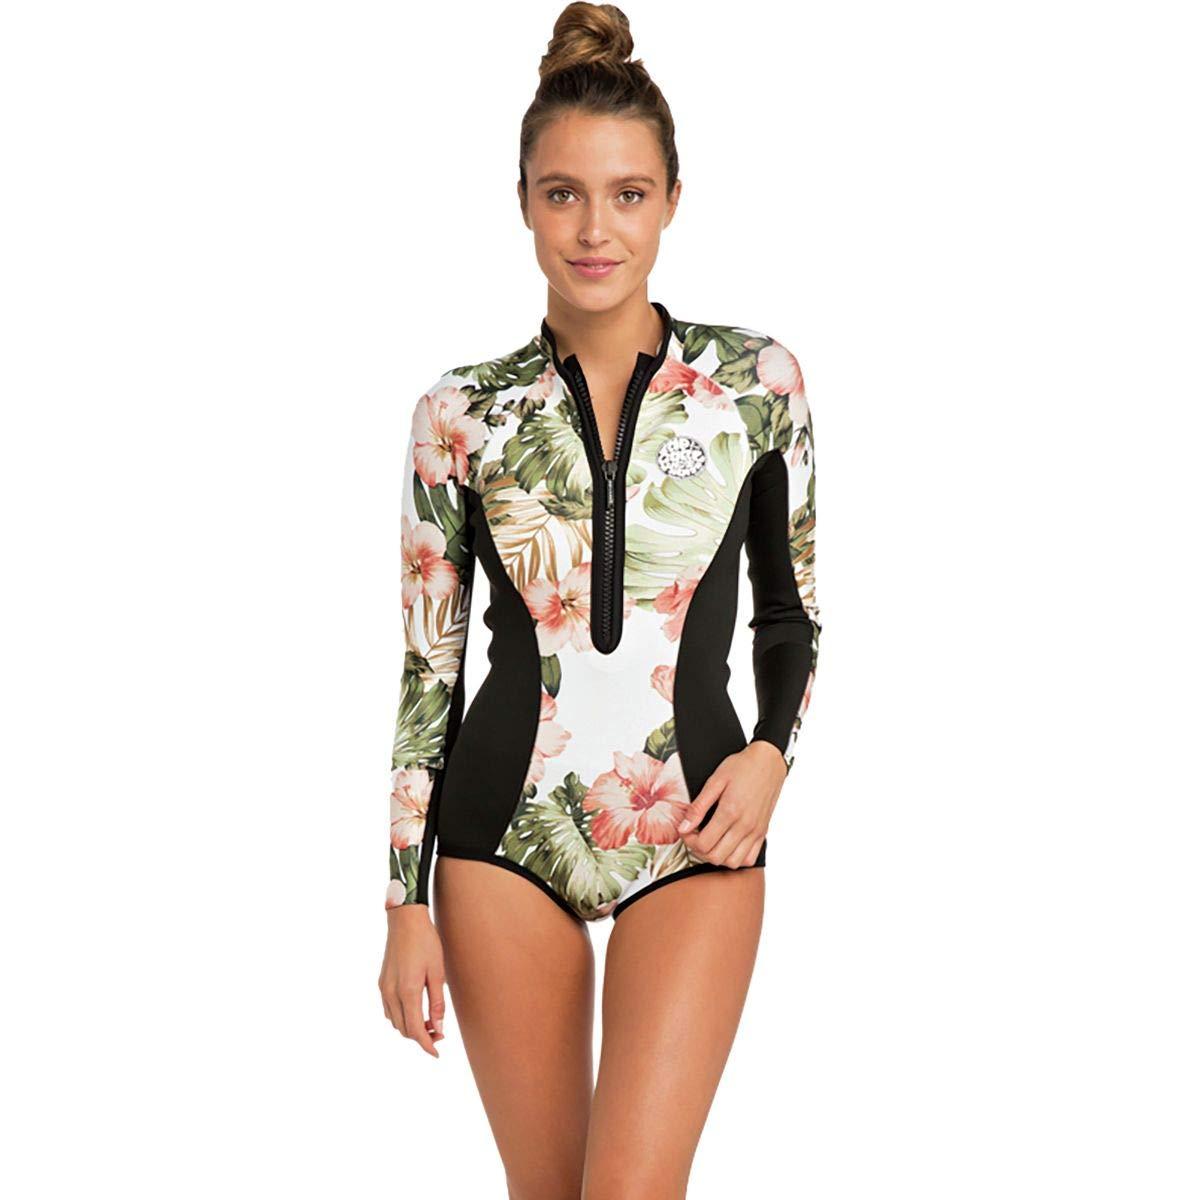 Rip Curl G Bomb Long Sleeve Bikini Cut Springsuit Wetsuit, Black/White, 6